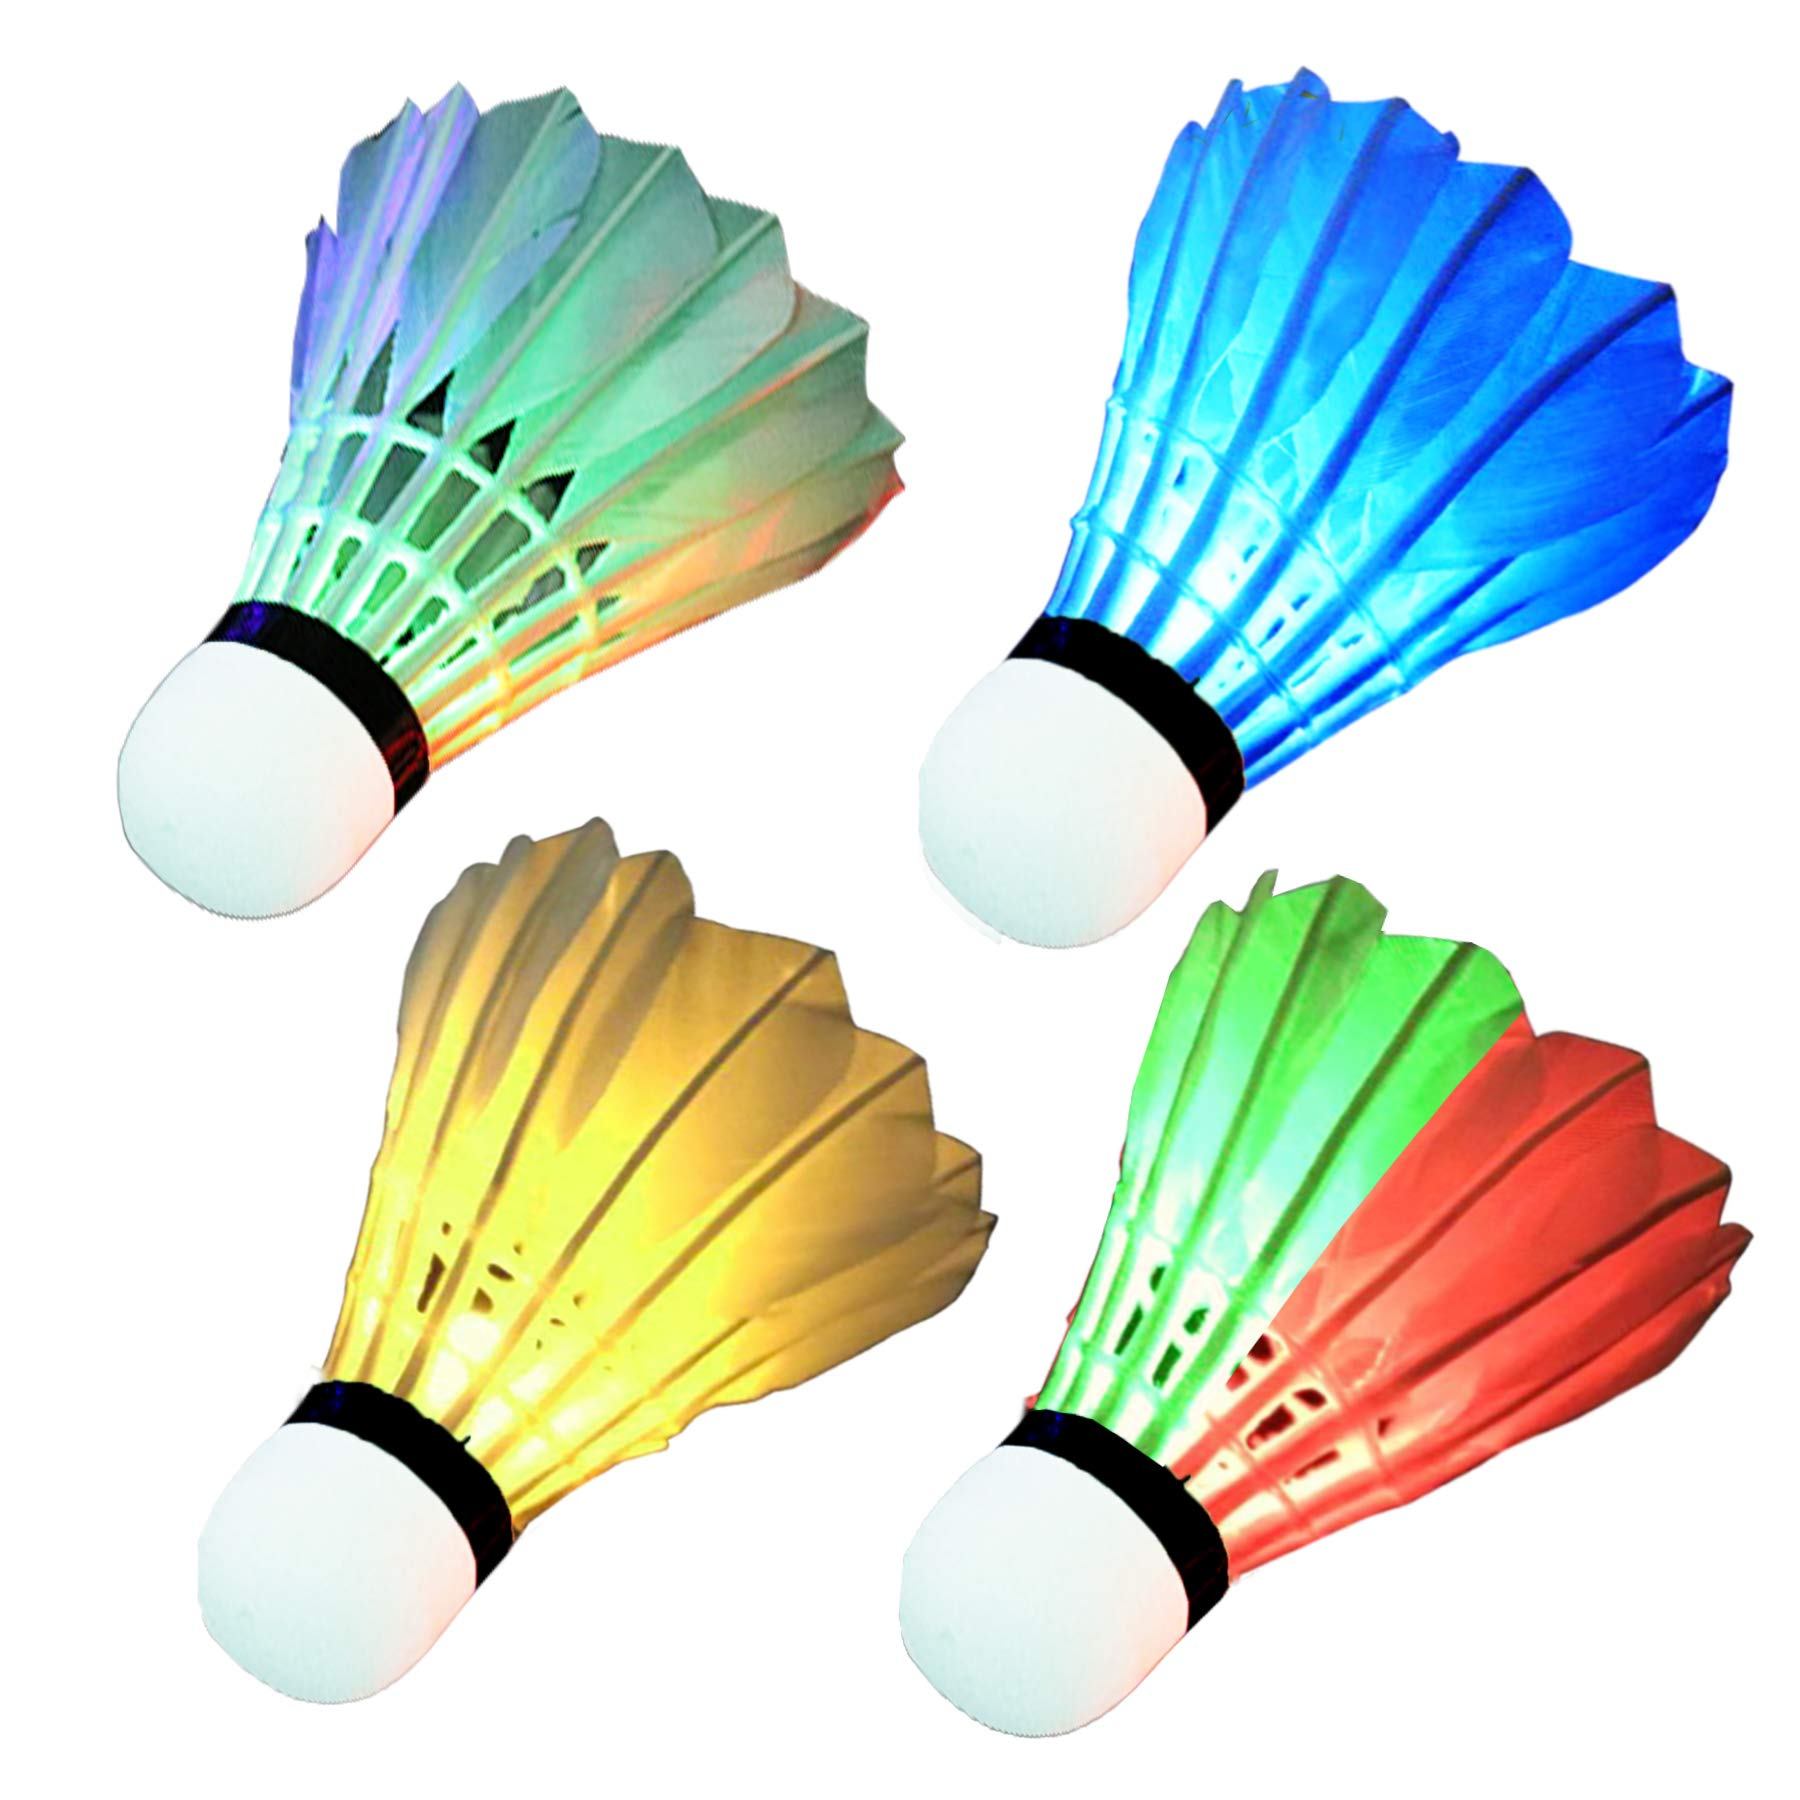 Garneck 12pcs Plastic Shuttlecocks Badminton Shuttlecocks Sport Sports Training Badminton Balls for Indoor Outdoor Game White